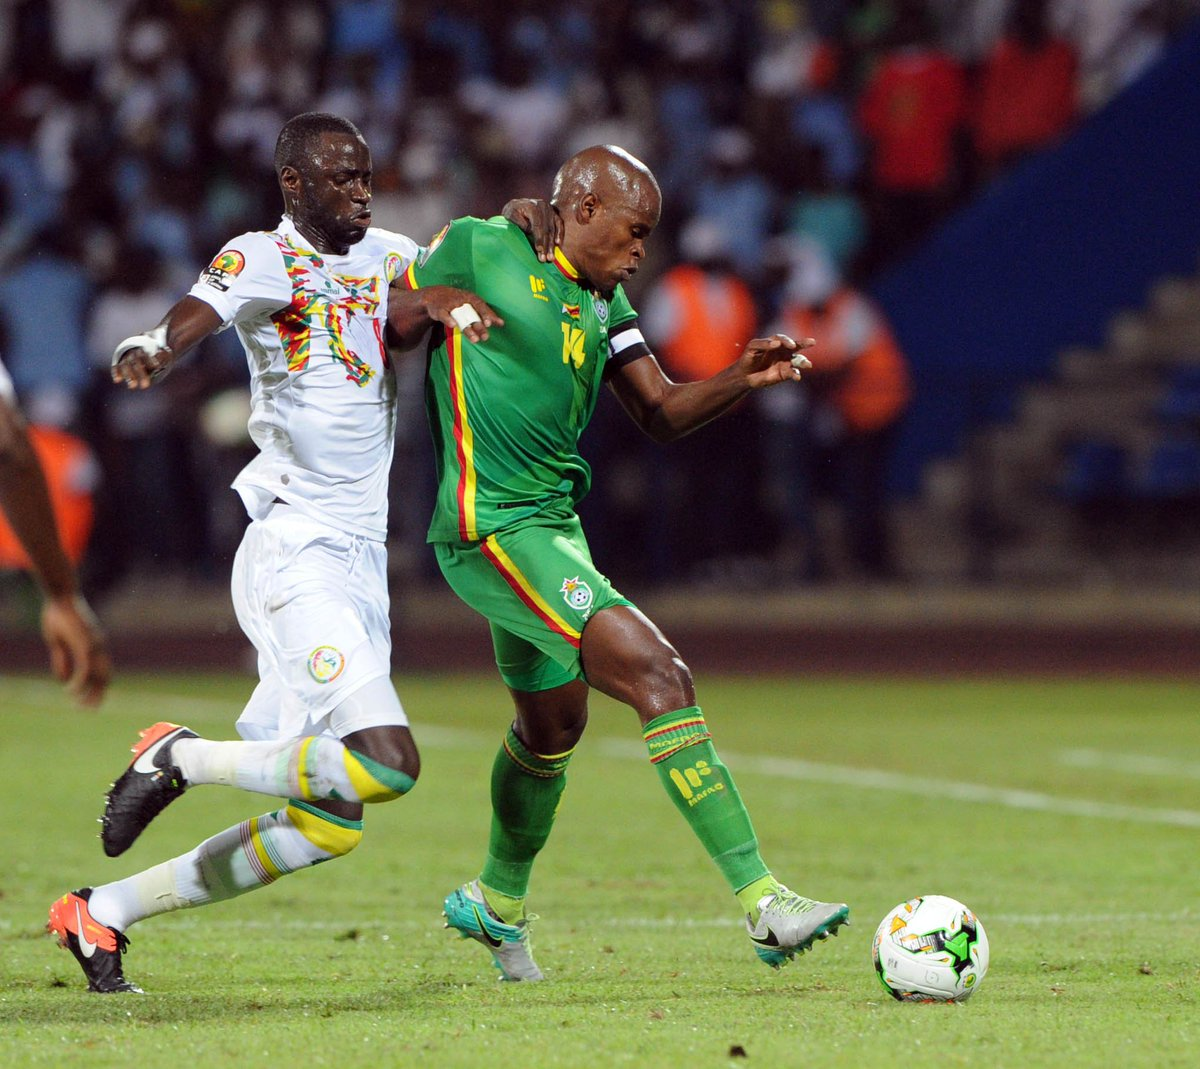 MATOKEO MICHUANO YA AFRICA AFCON 19.1.2017